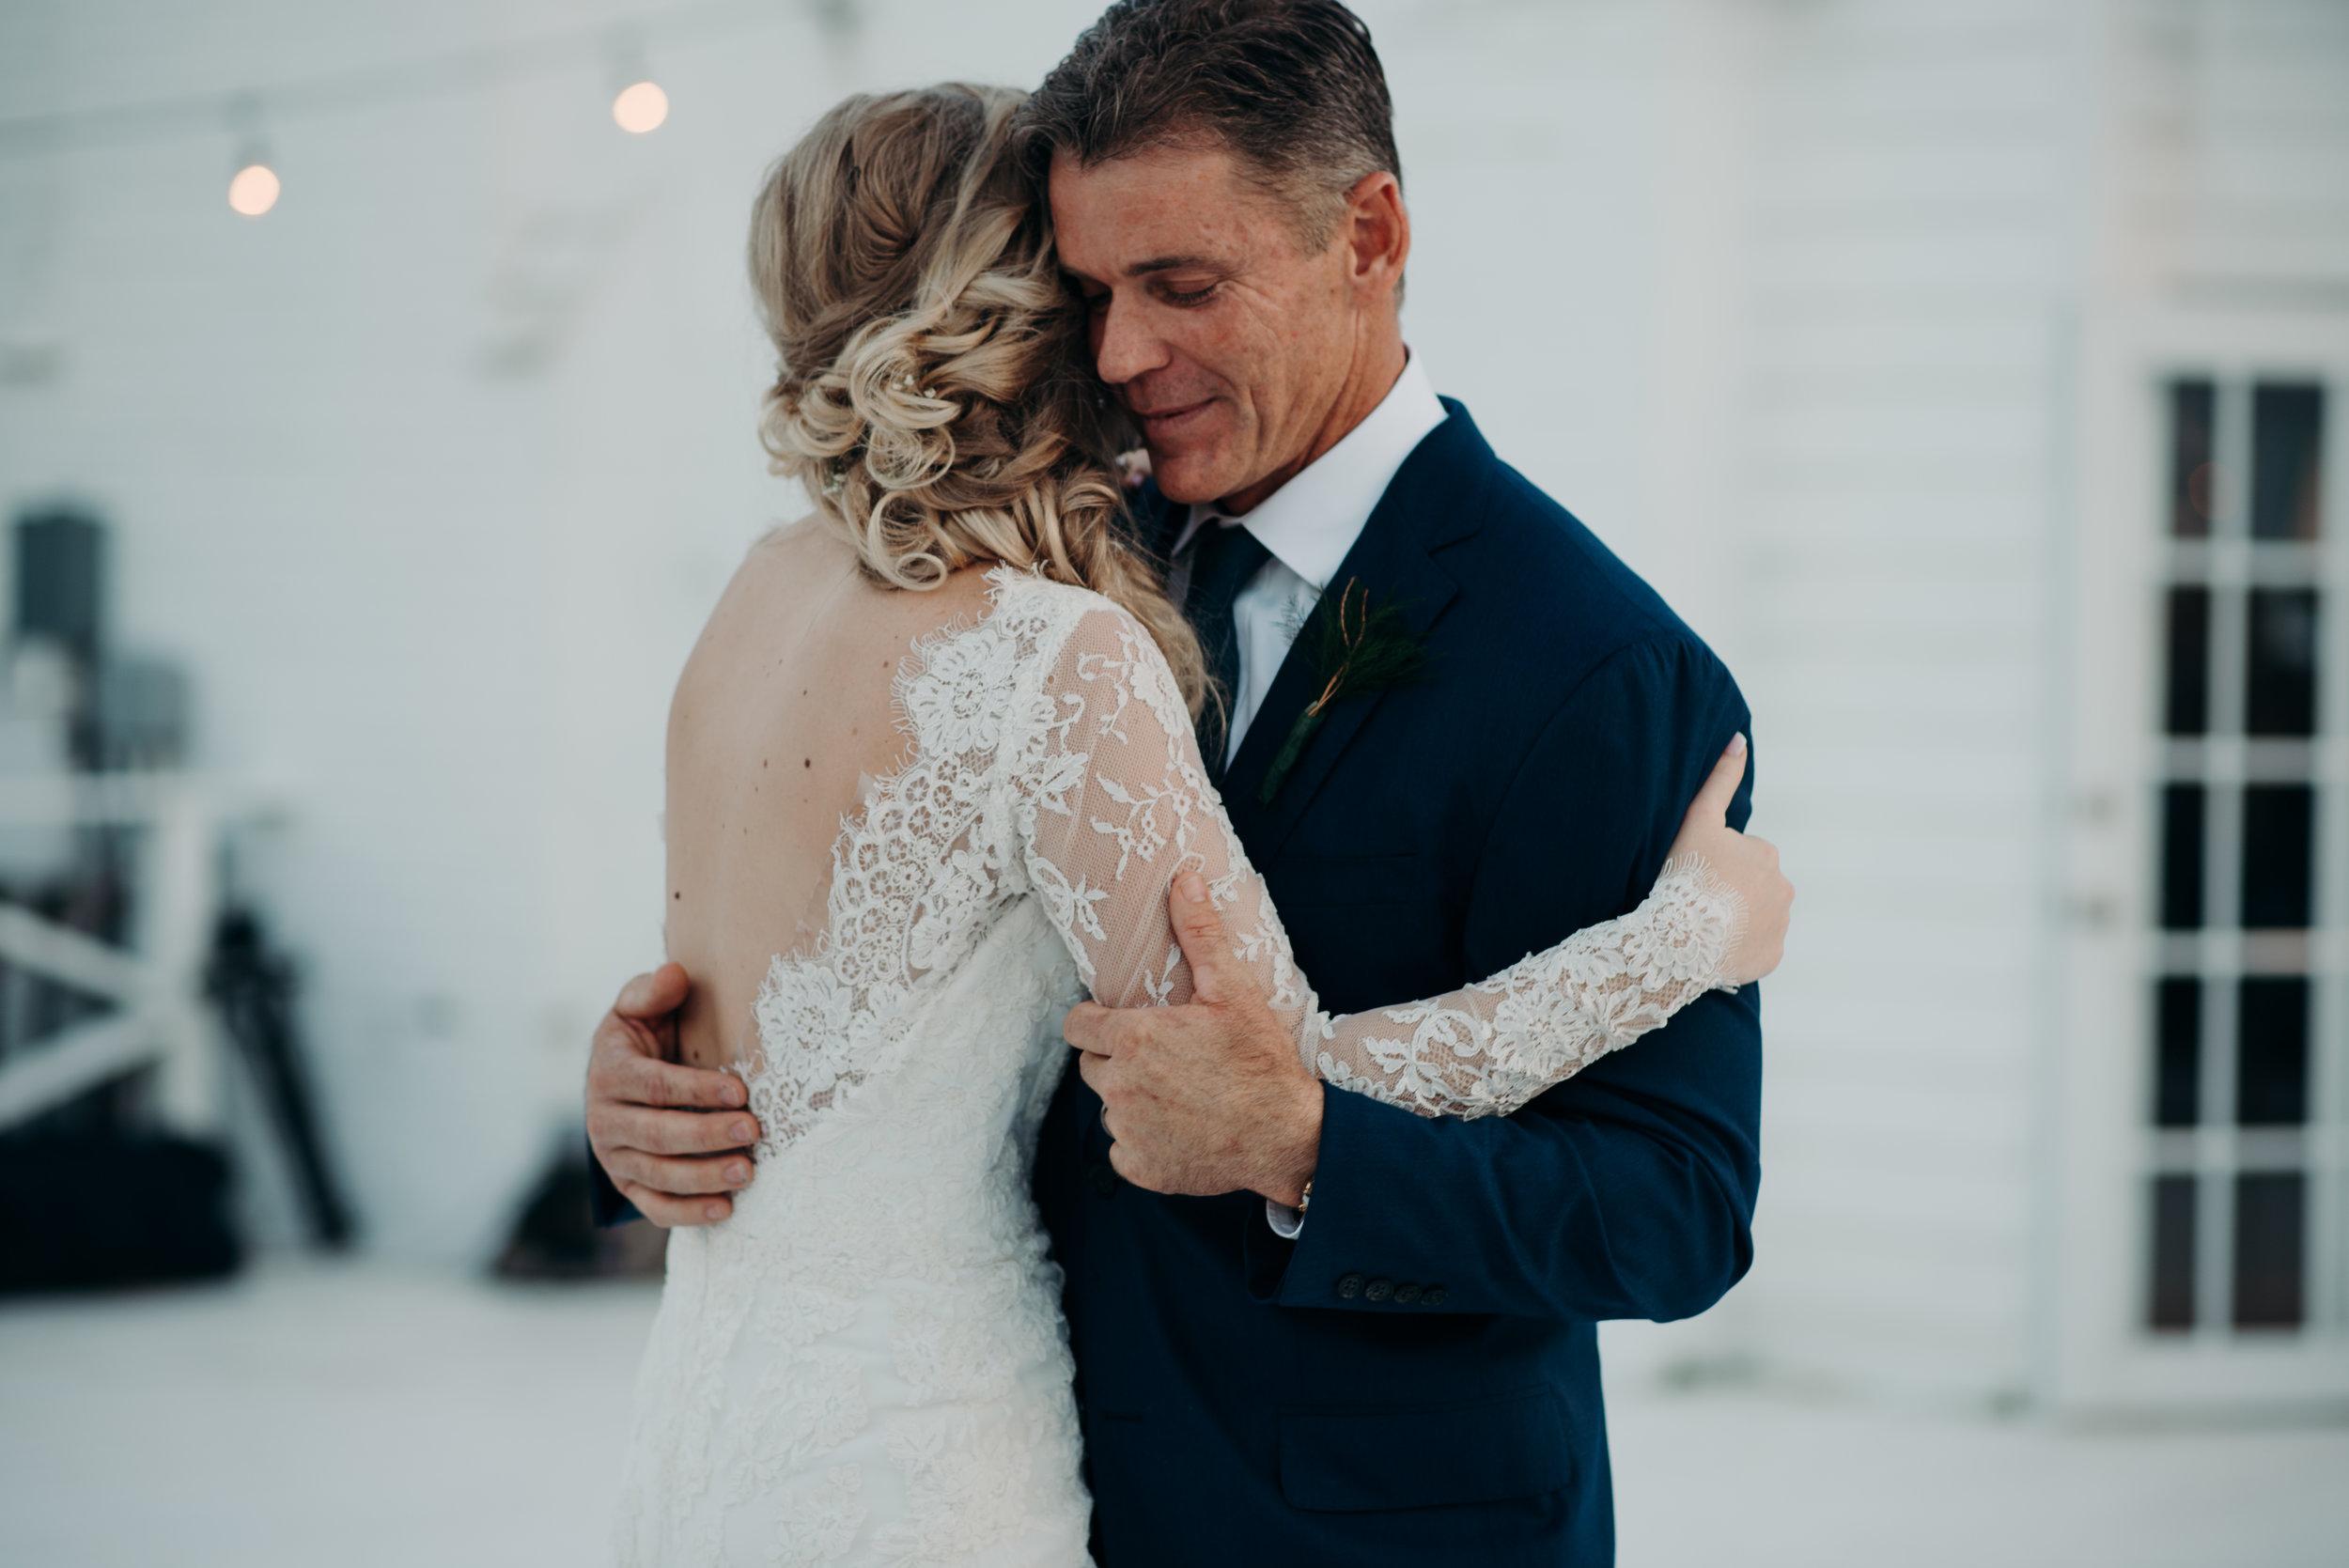 micayla-greyson-neumann-vero-beach-lake-house-winter-white-wedding-photography-1055.jpg